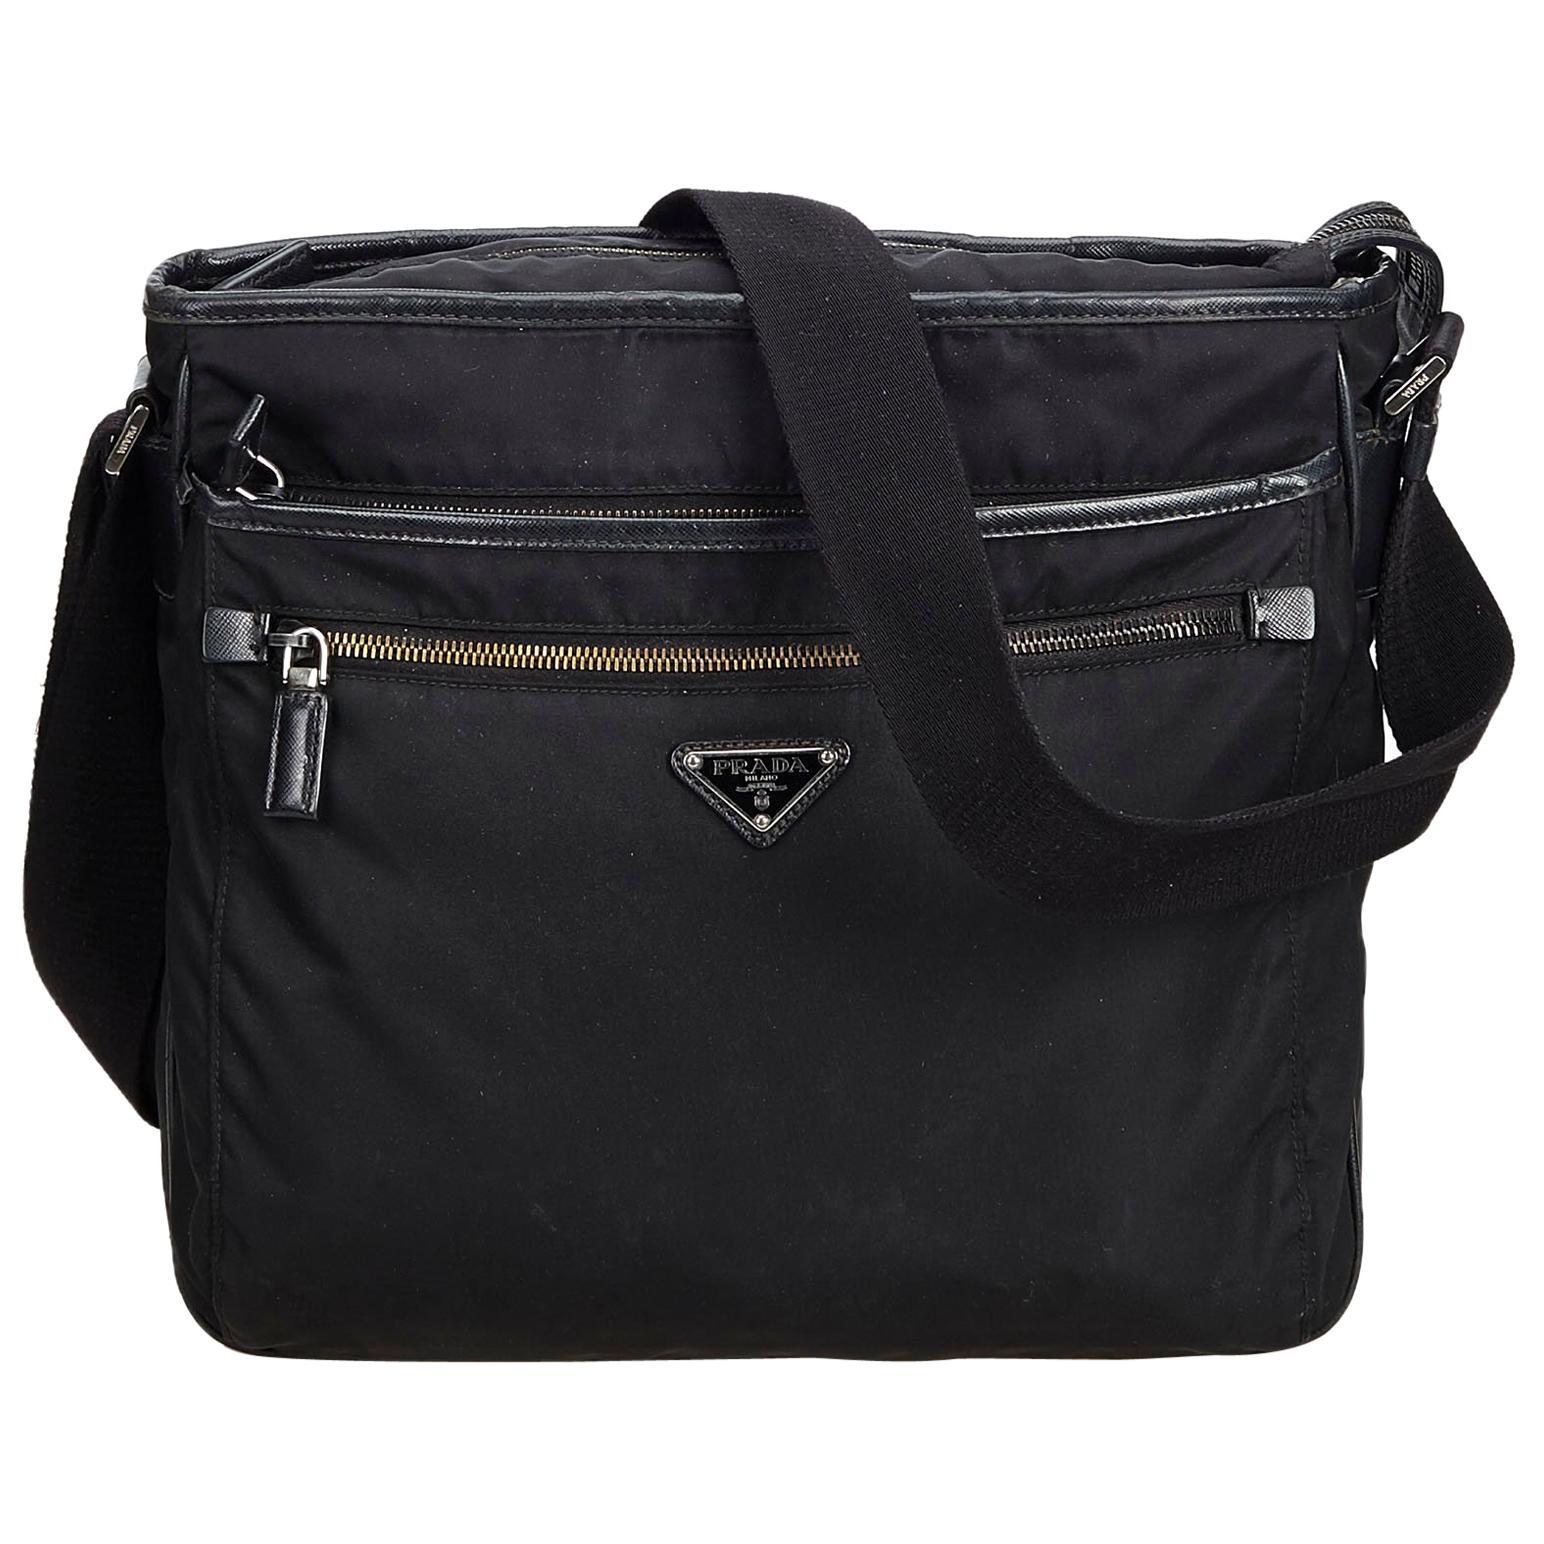 70aa54210572 Vintage Prada Crossbody Bags and Messenger Bags - 127 For Sale at 1stdibs